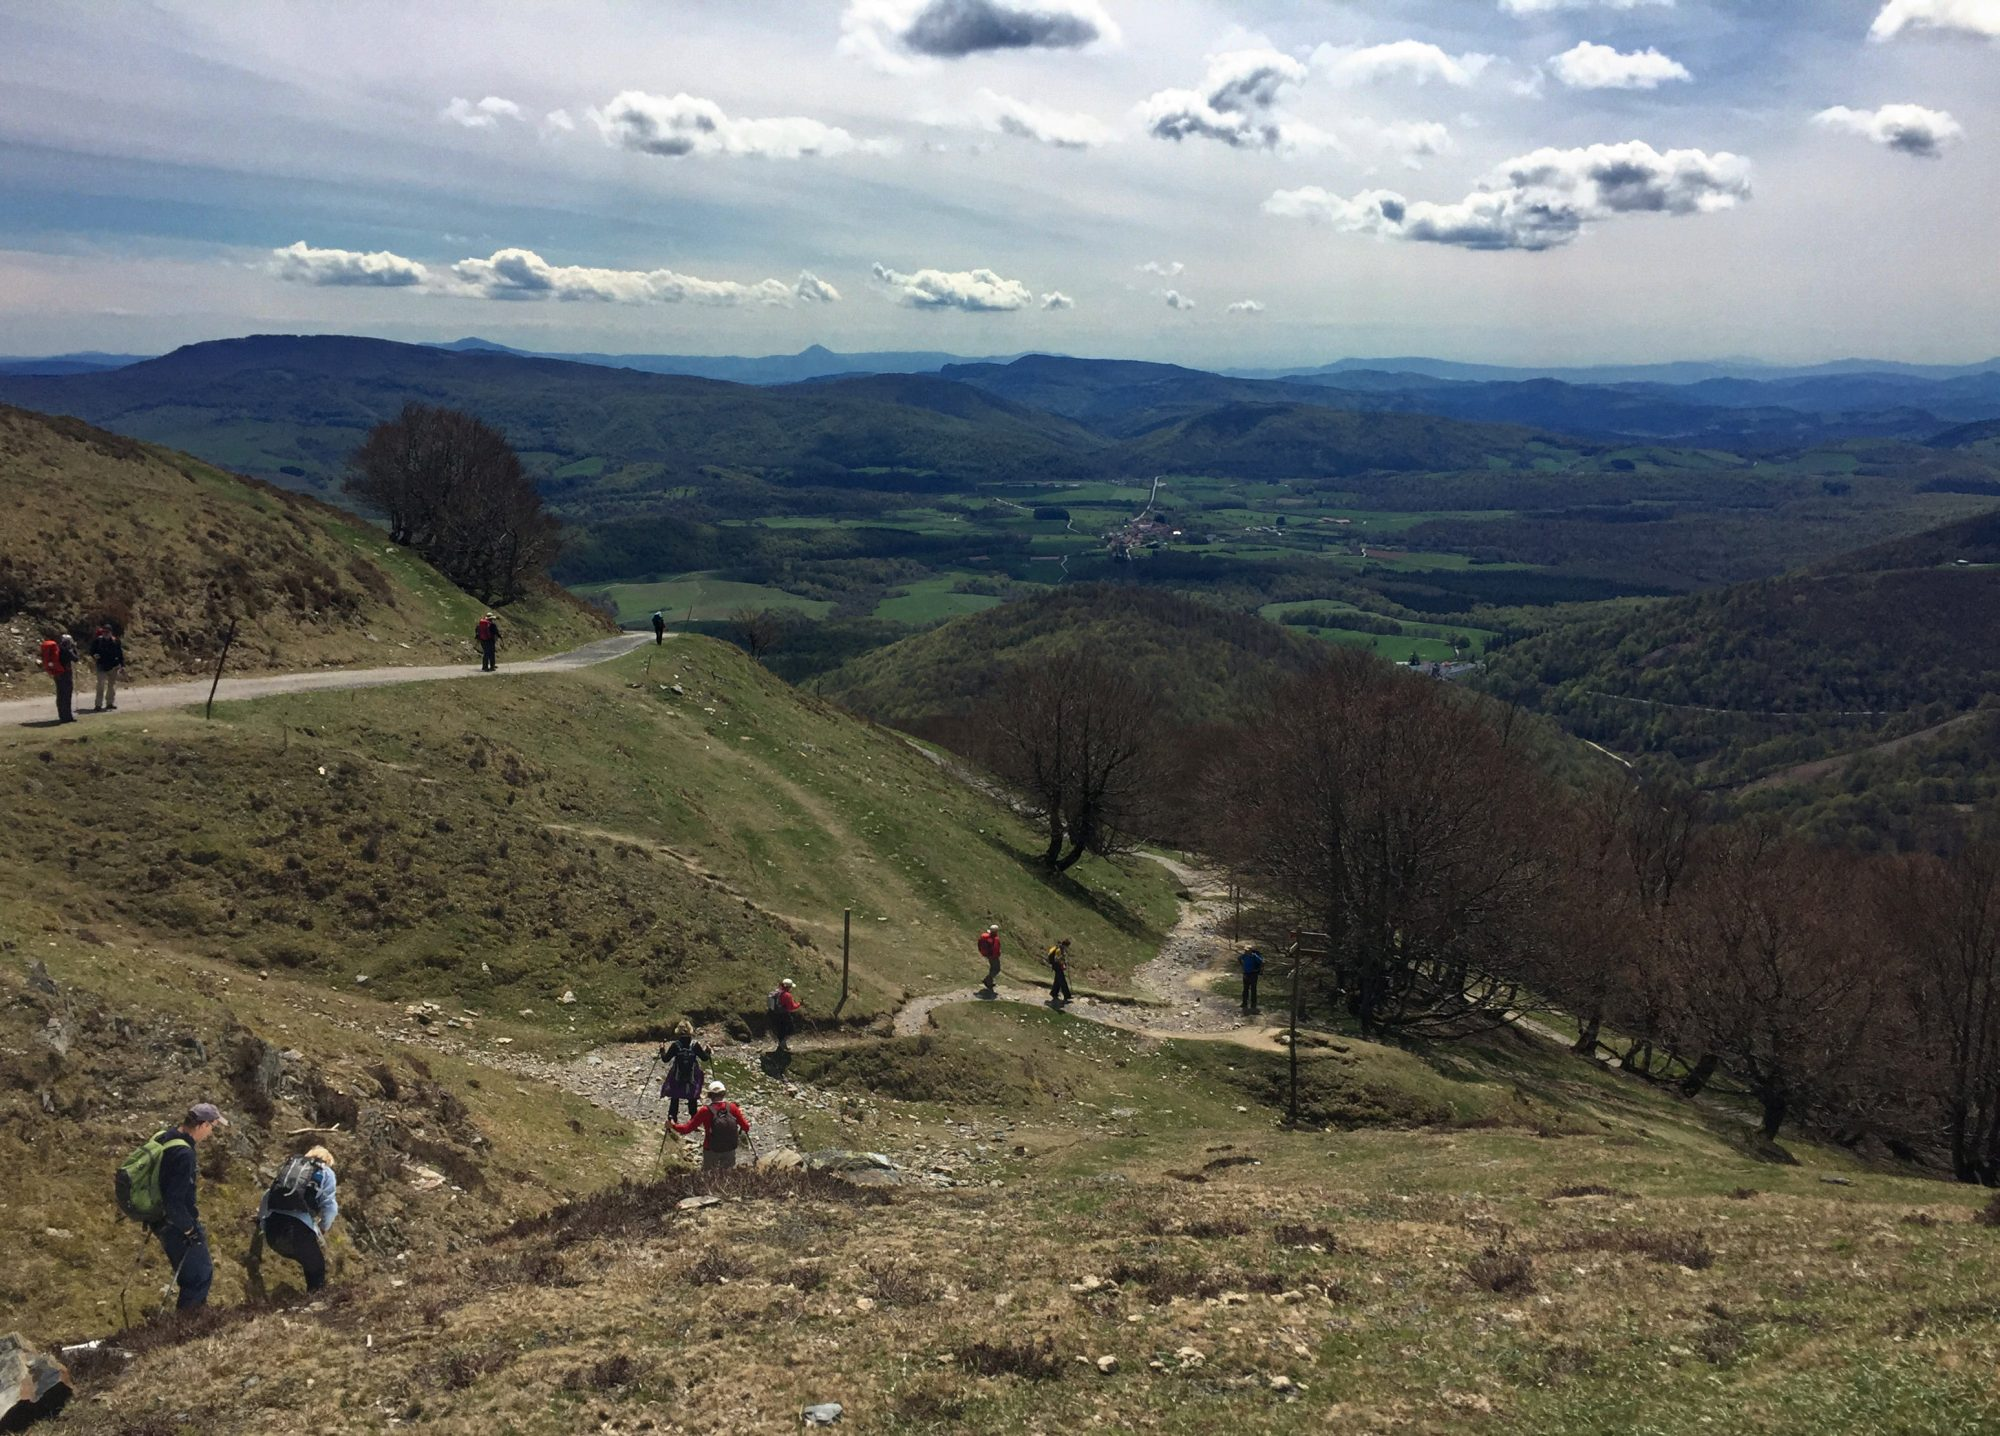 Wanderwege auf dem Ibaneta Pass, Camino Francés, Wandern, Wandertour, Pilgern, Jakobsweg, Pyrenäeen, Frankreich, Spanien